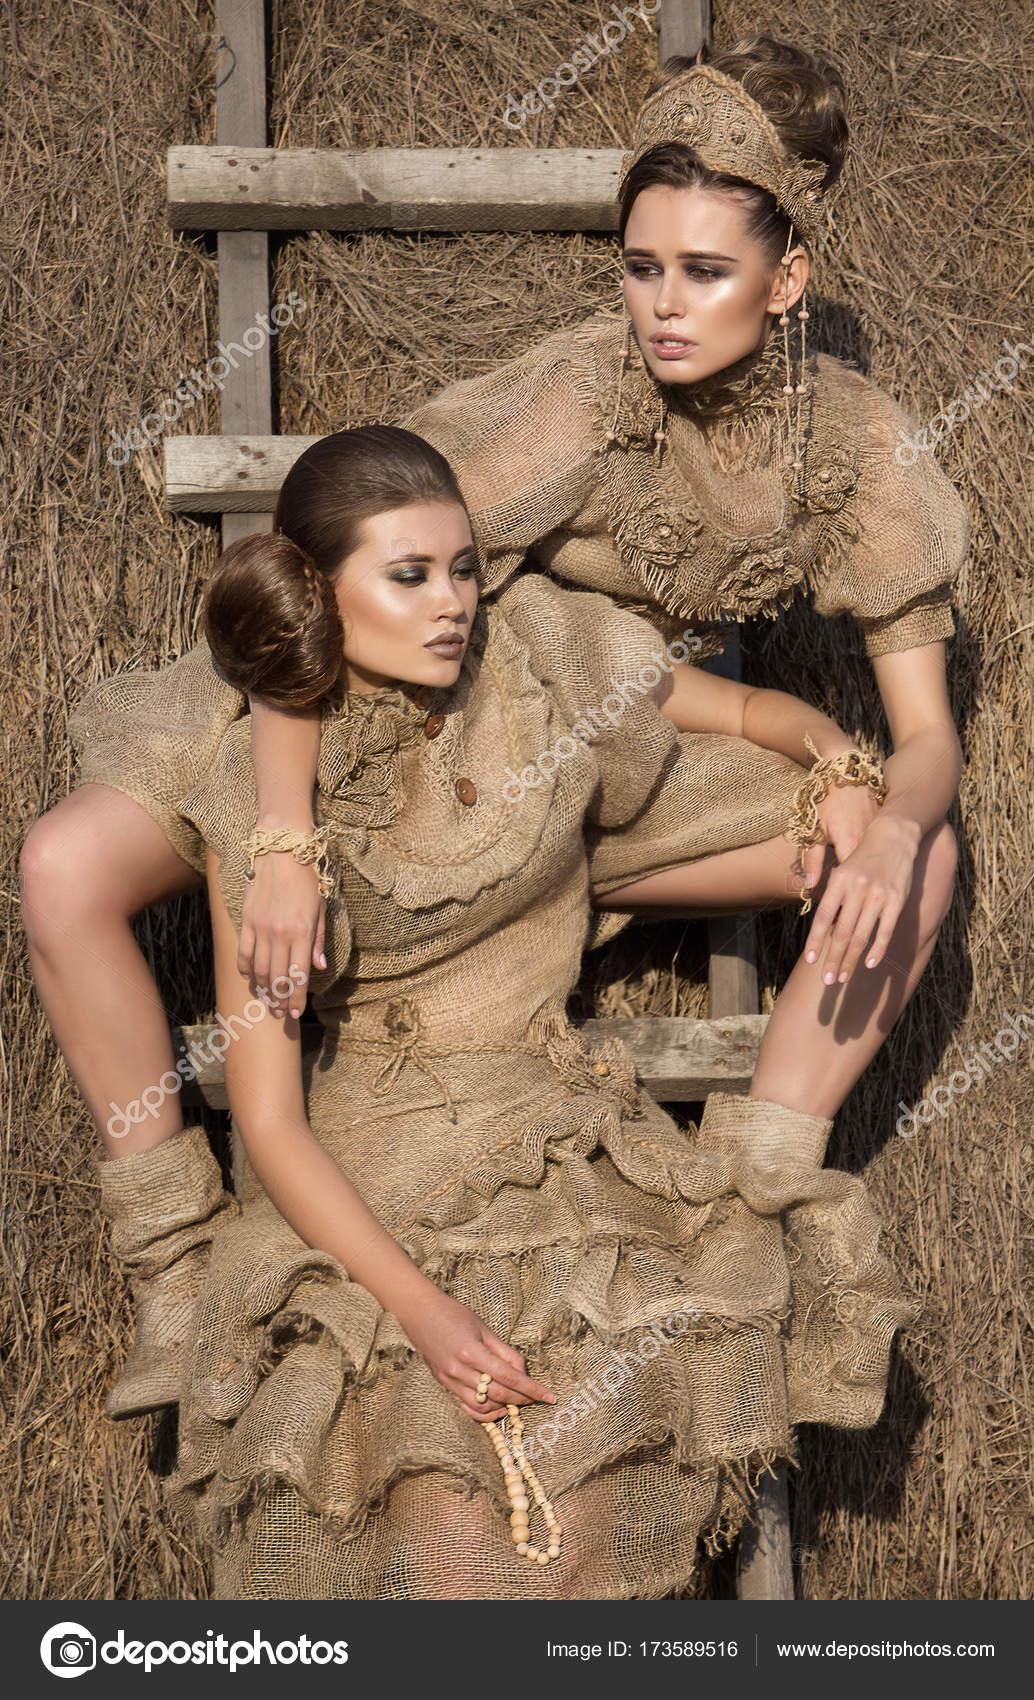 Vestidos Dos ChicasModelosAmigos Hermosas Hermosos Rurales En dsrtxBQCh